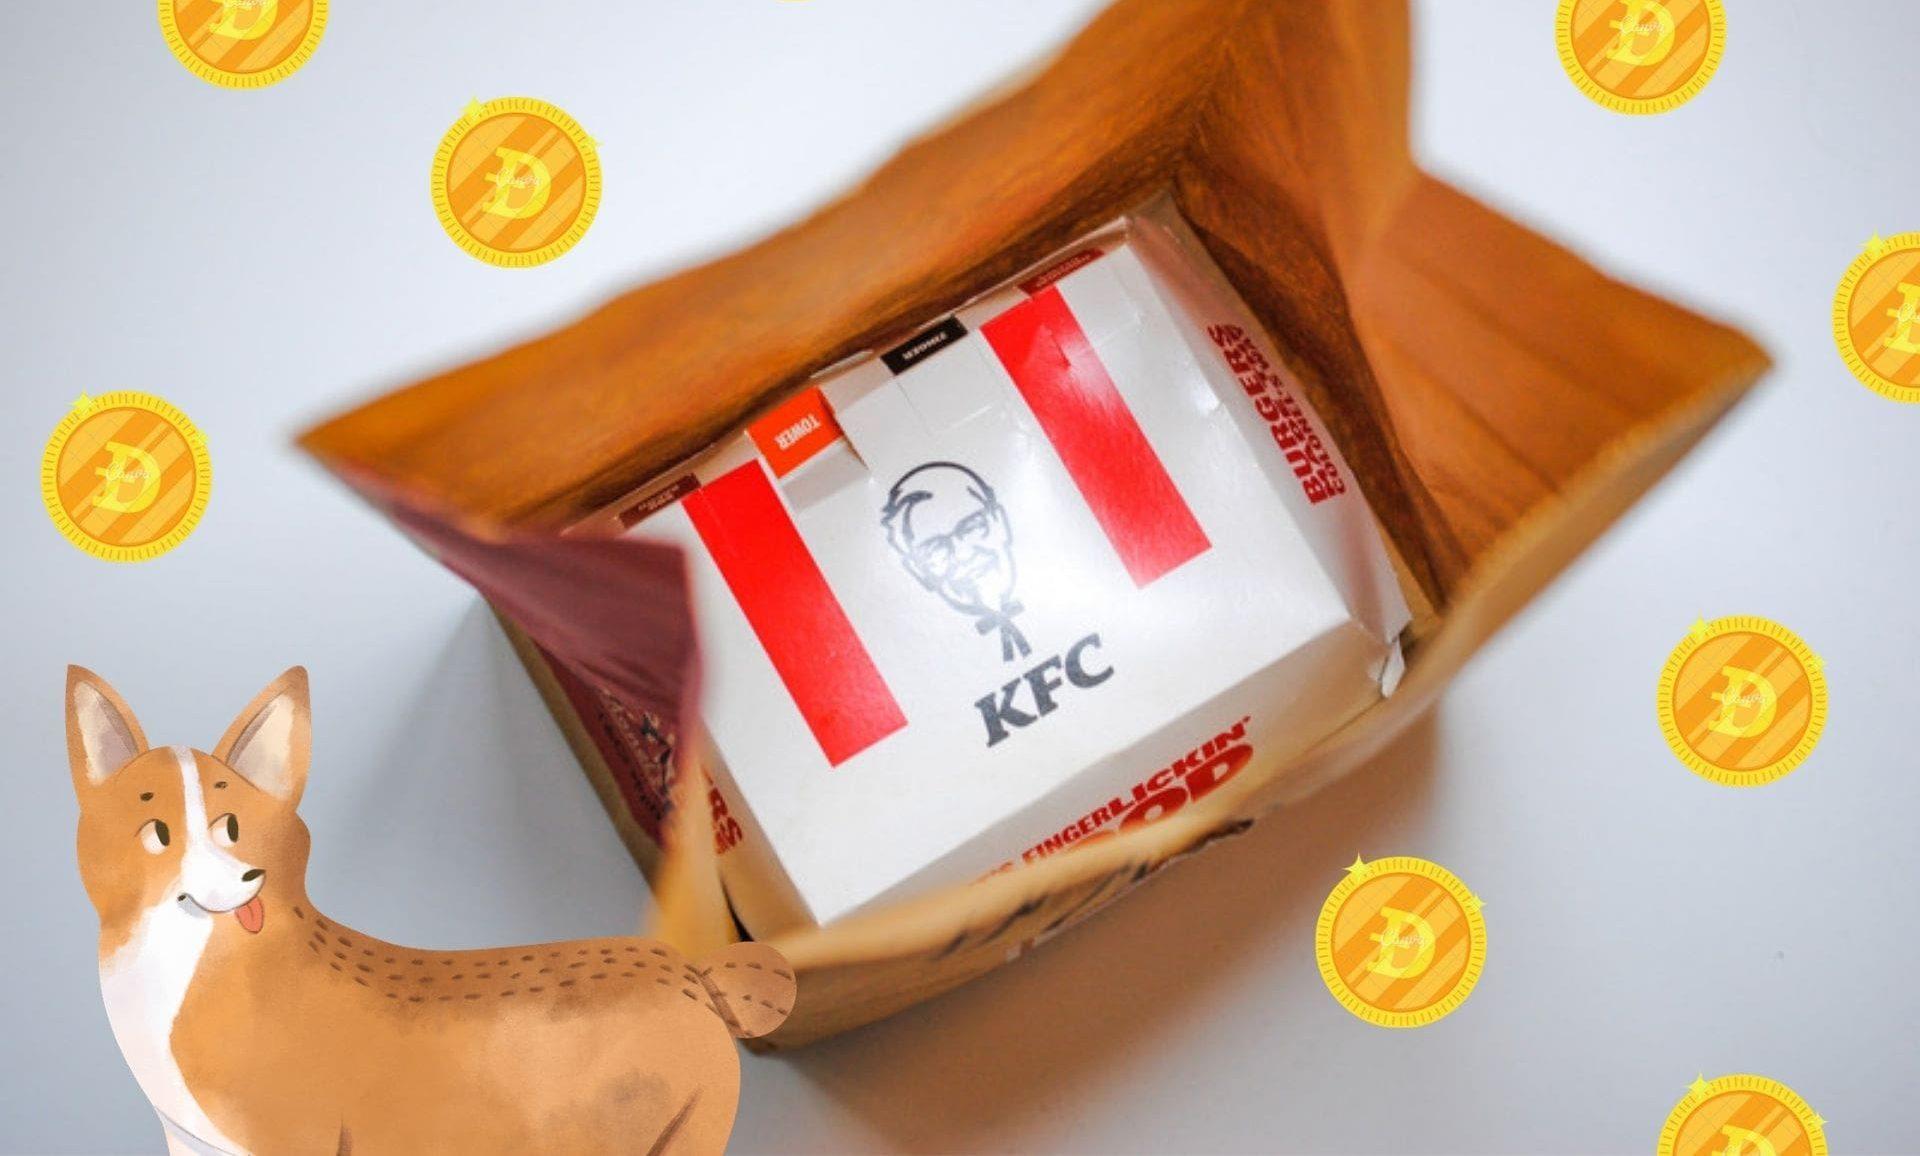 dogecoin-kfc